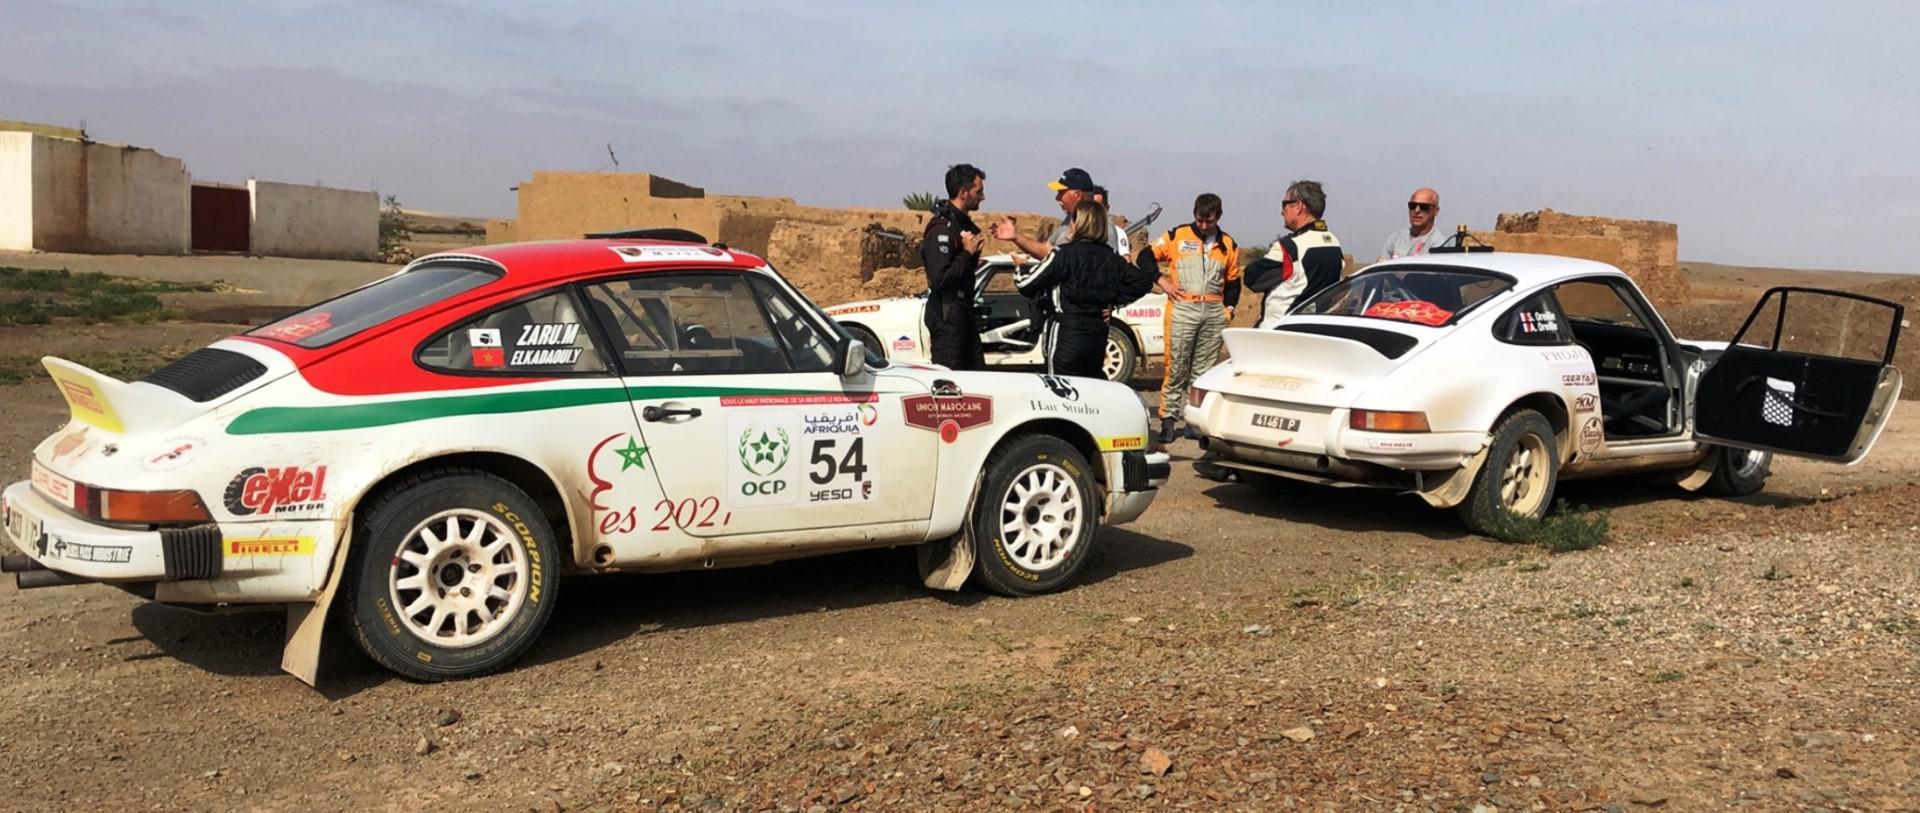 un-talentueux-pilote-marocain-decouvert-grace-au-maroc-historic-rally-1081-13.jpg